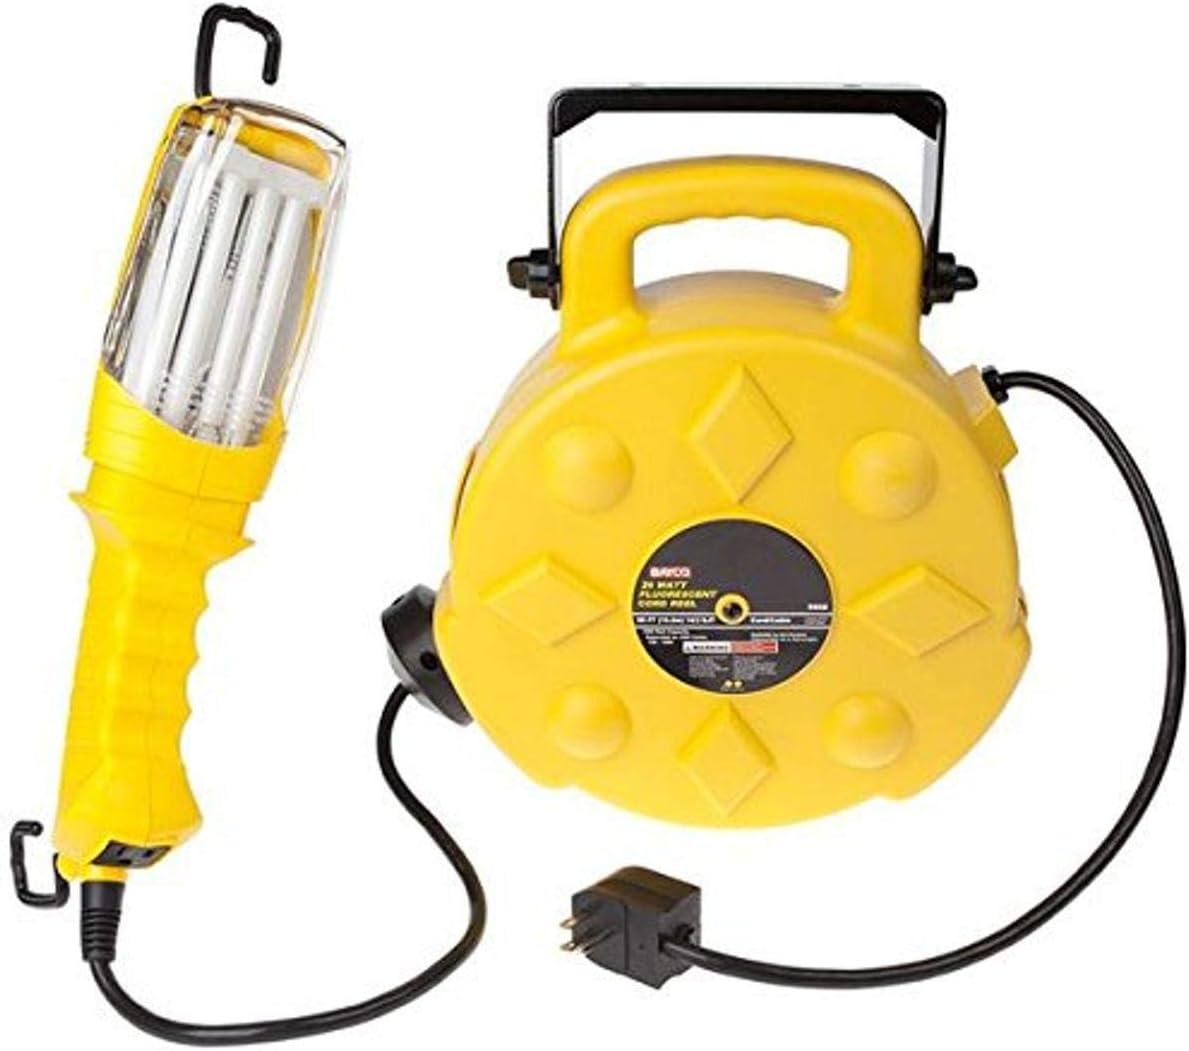 Bayco sale SL-8908 Fluorescent Phoenix Mall Yellow Lights